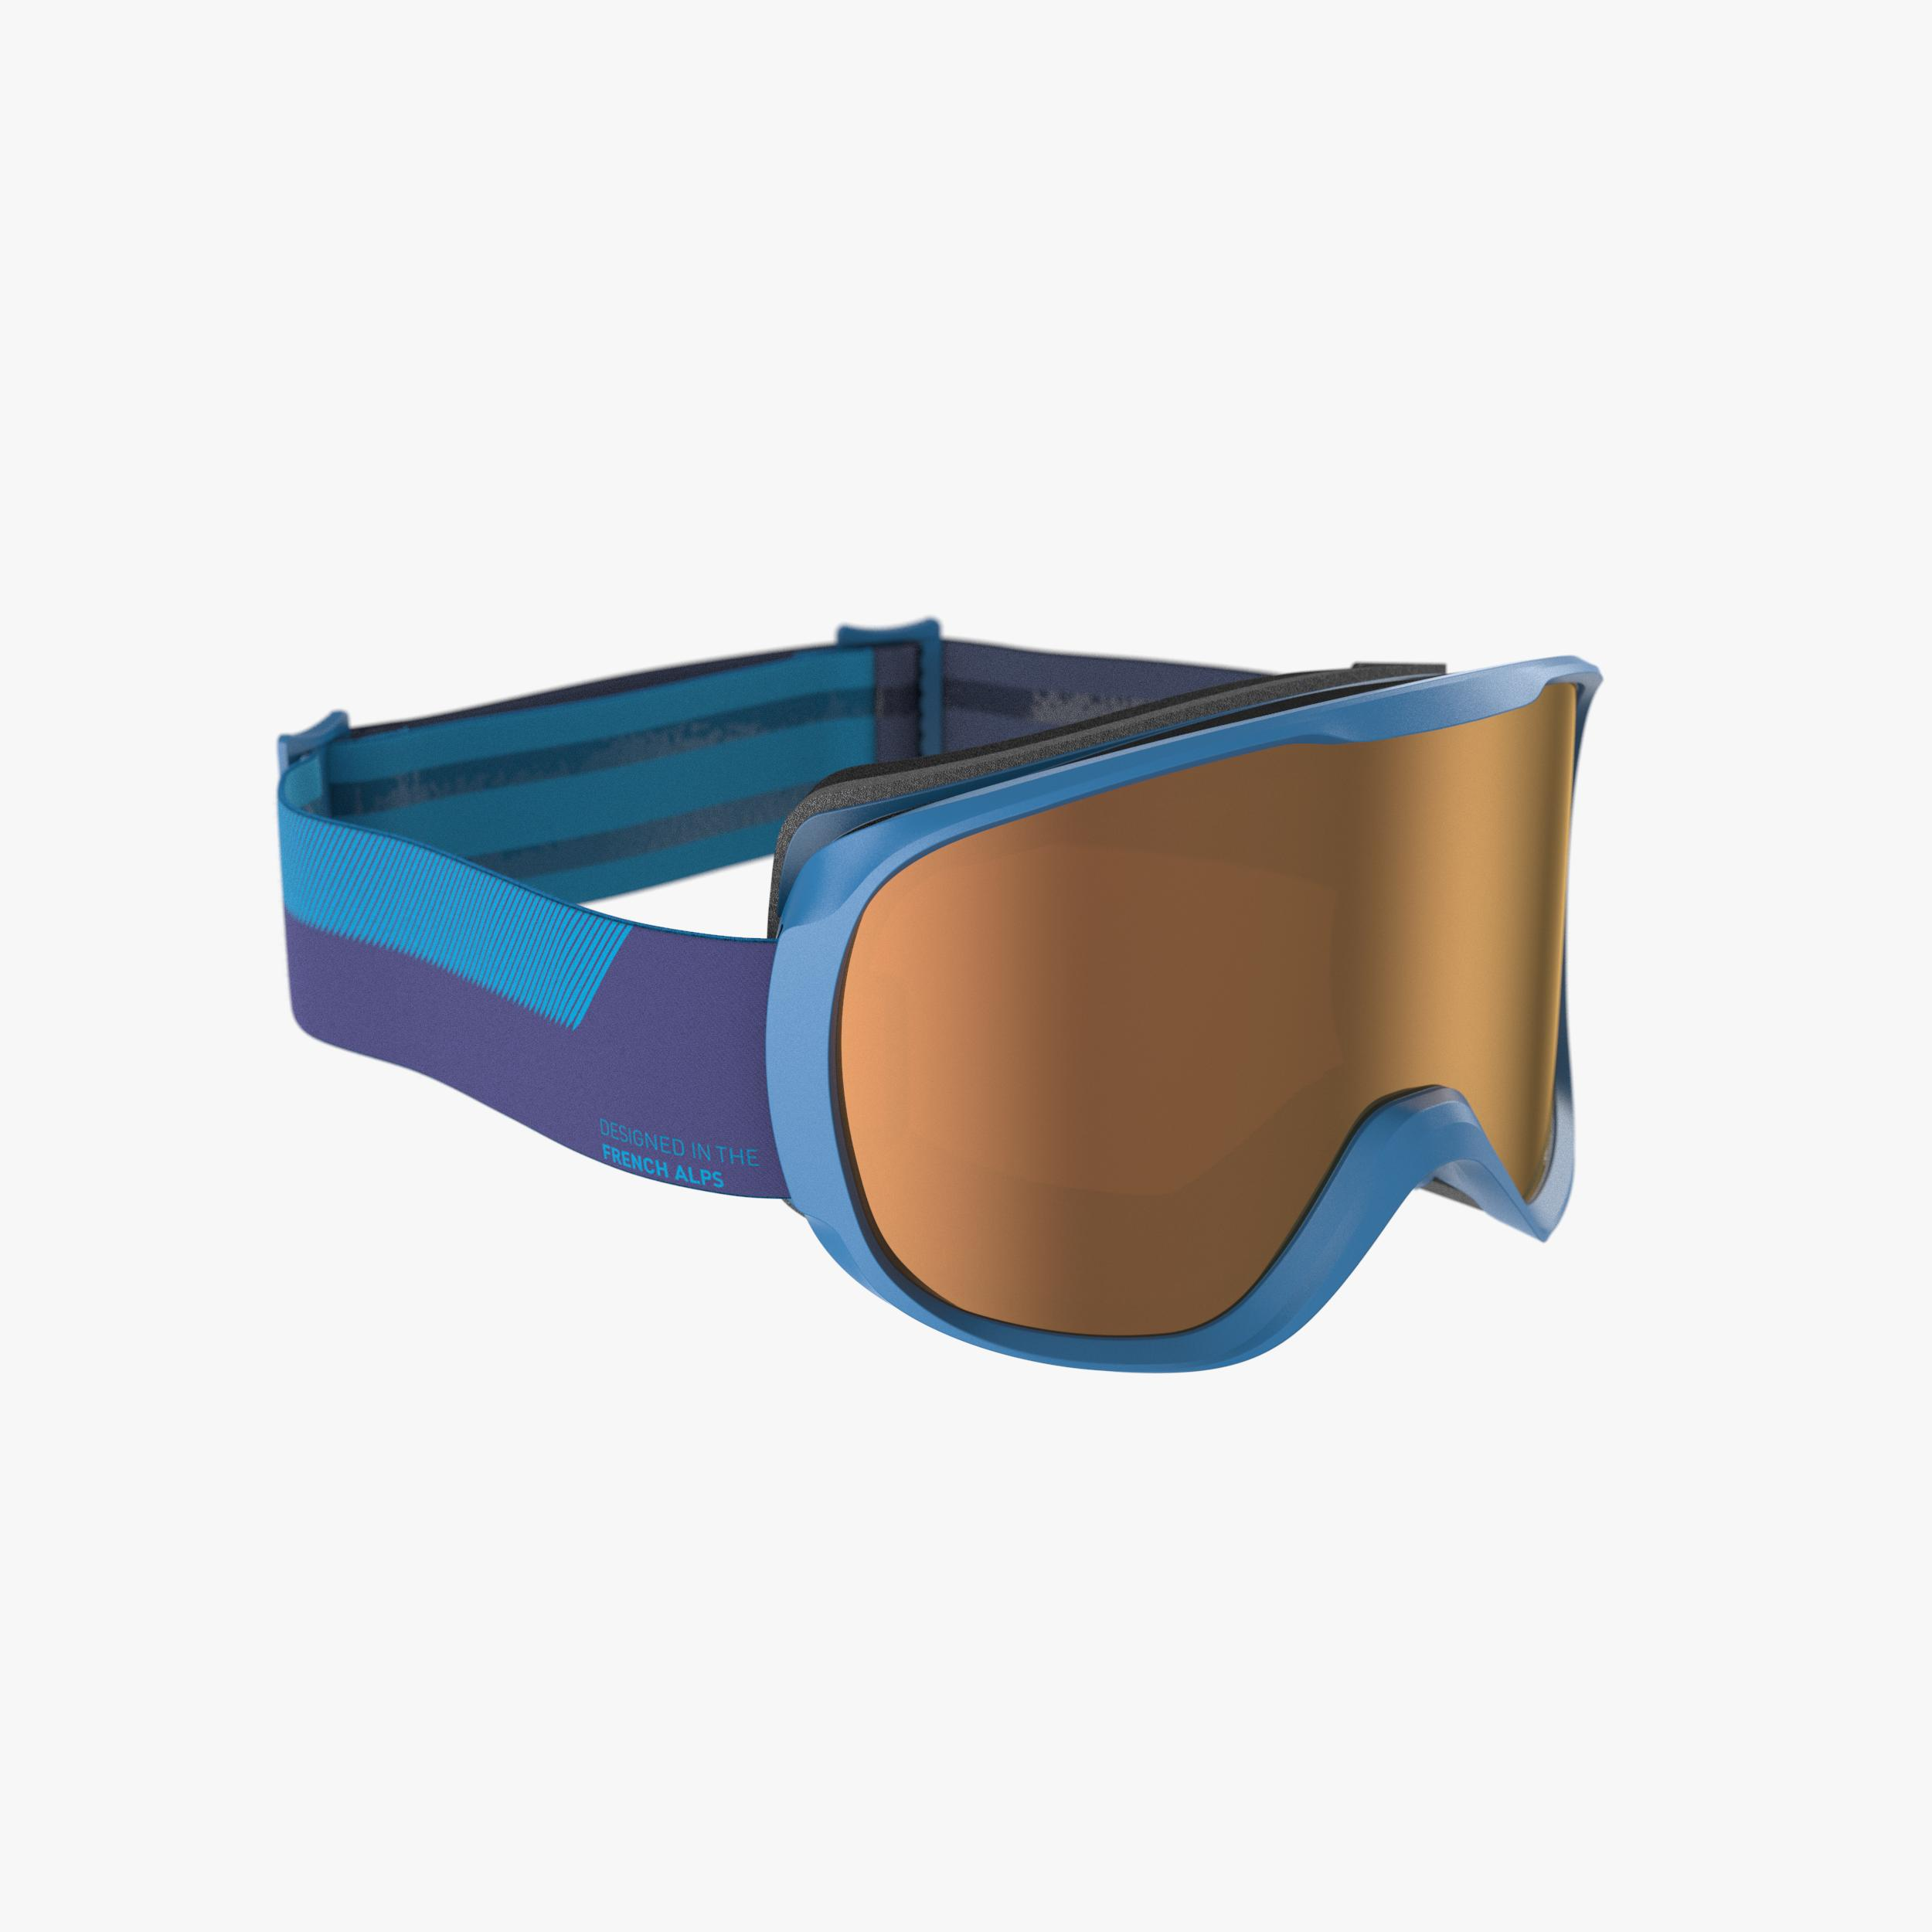 Ochelari schi G 500 S3 imagine